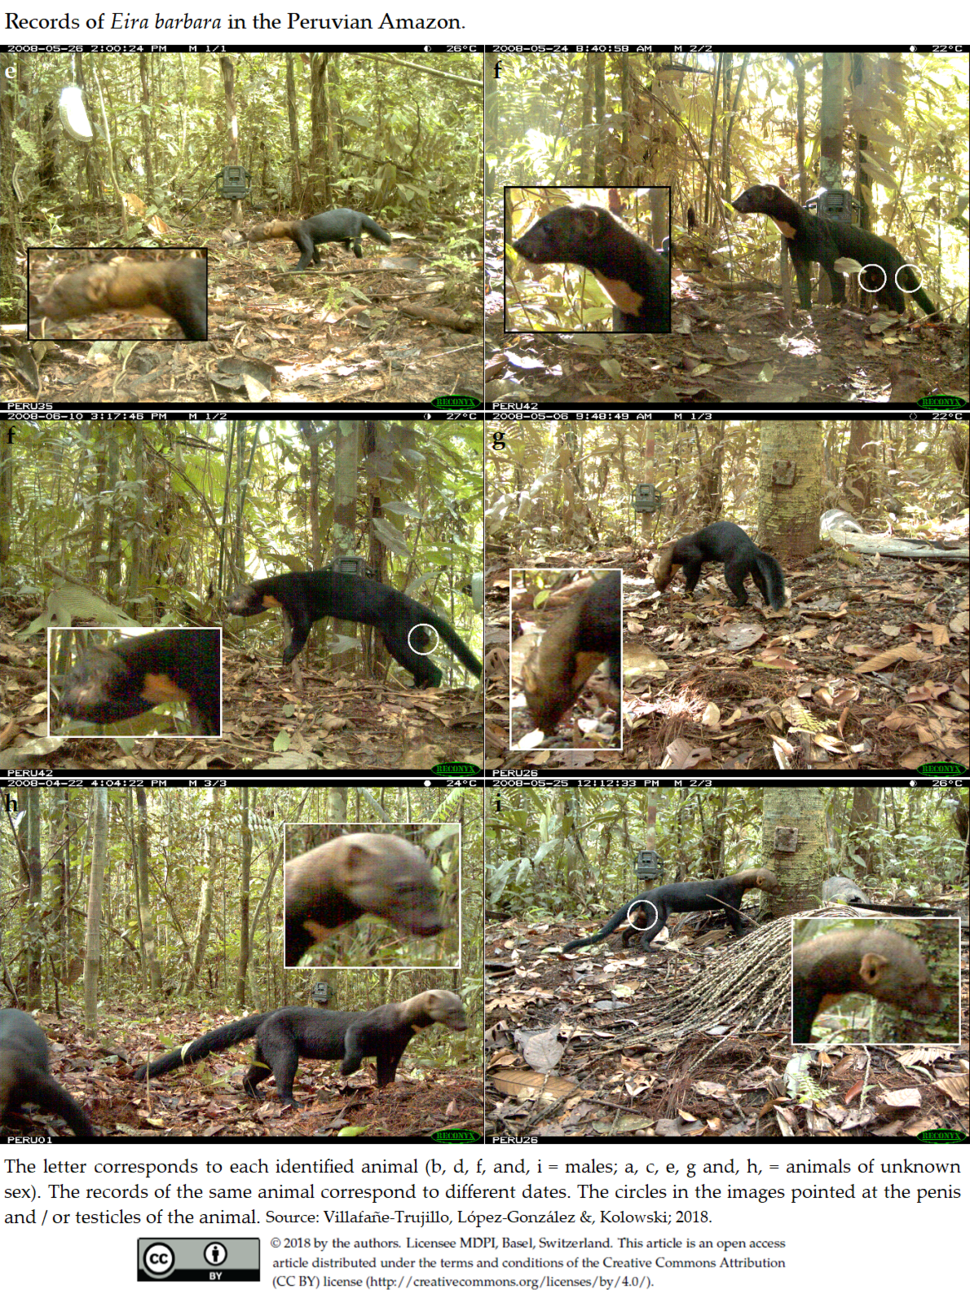 Records of Eira barbara in the Peruvian Amazon. 2 of 2